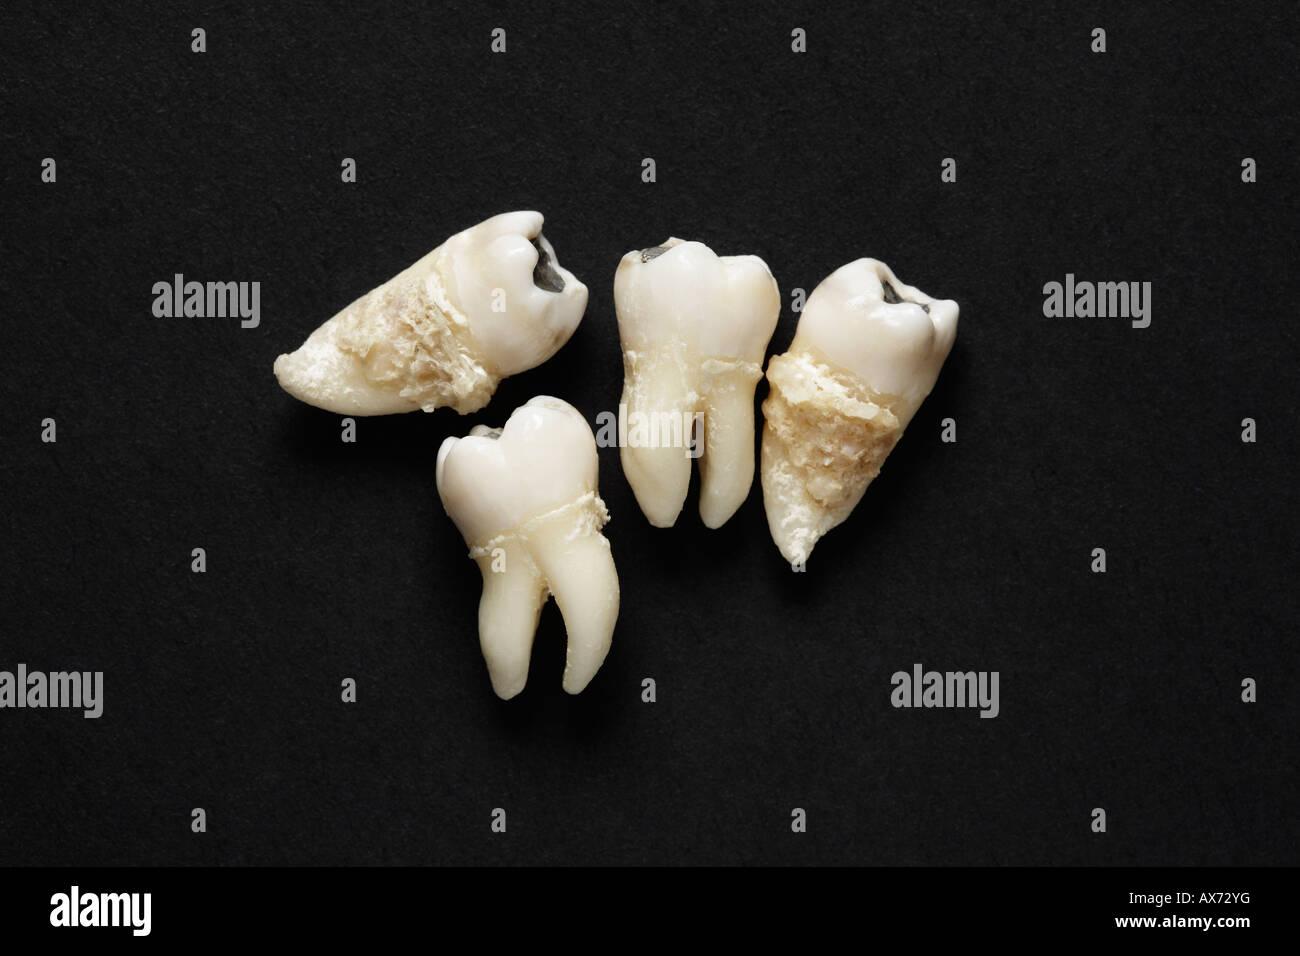 Extracted teeth on dark background - Stock Image